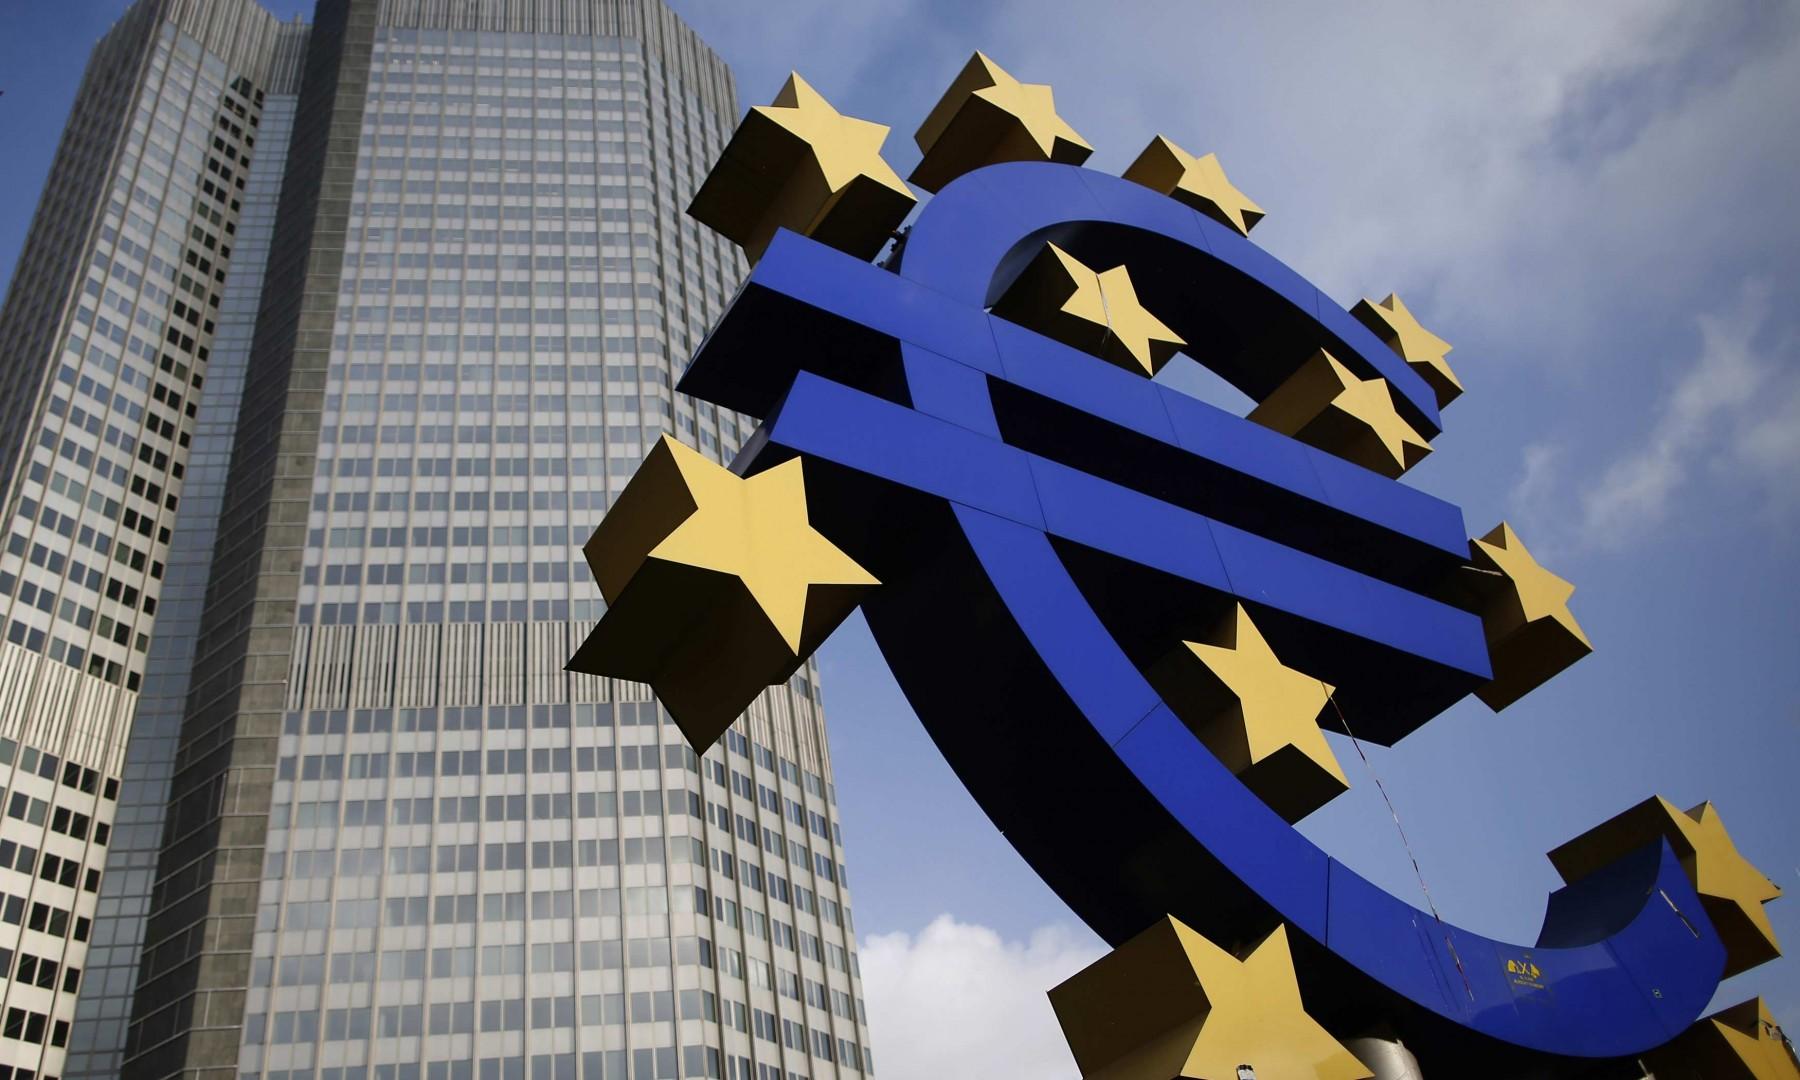 https://img2.s3wfg.com/web/img/images_uploaded/9/c/euro-monnaie.jpg